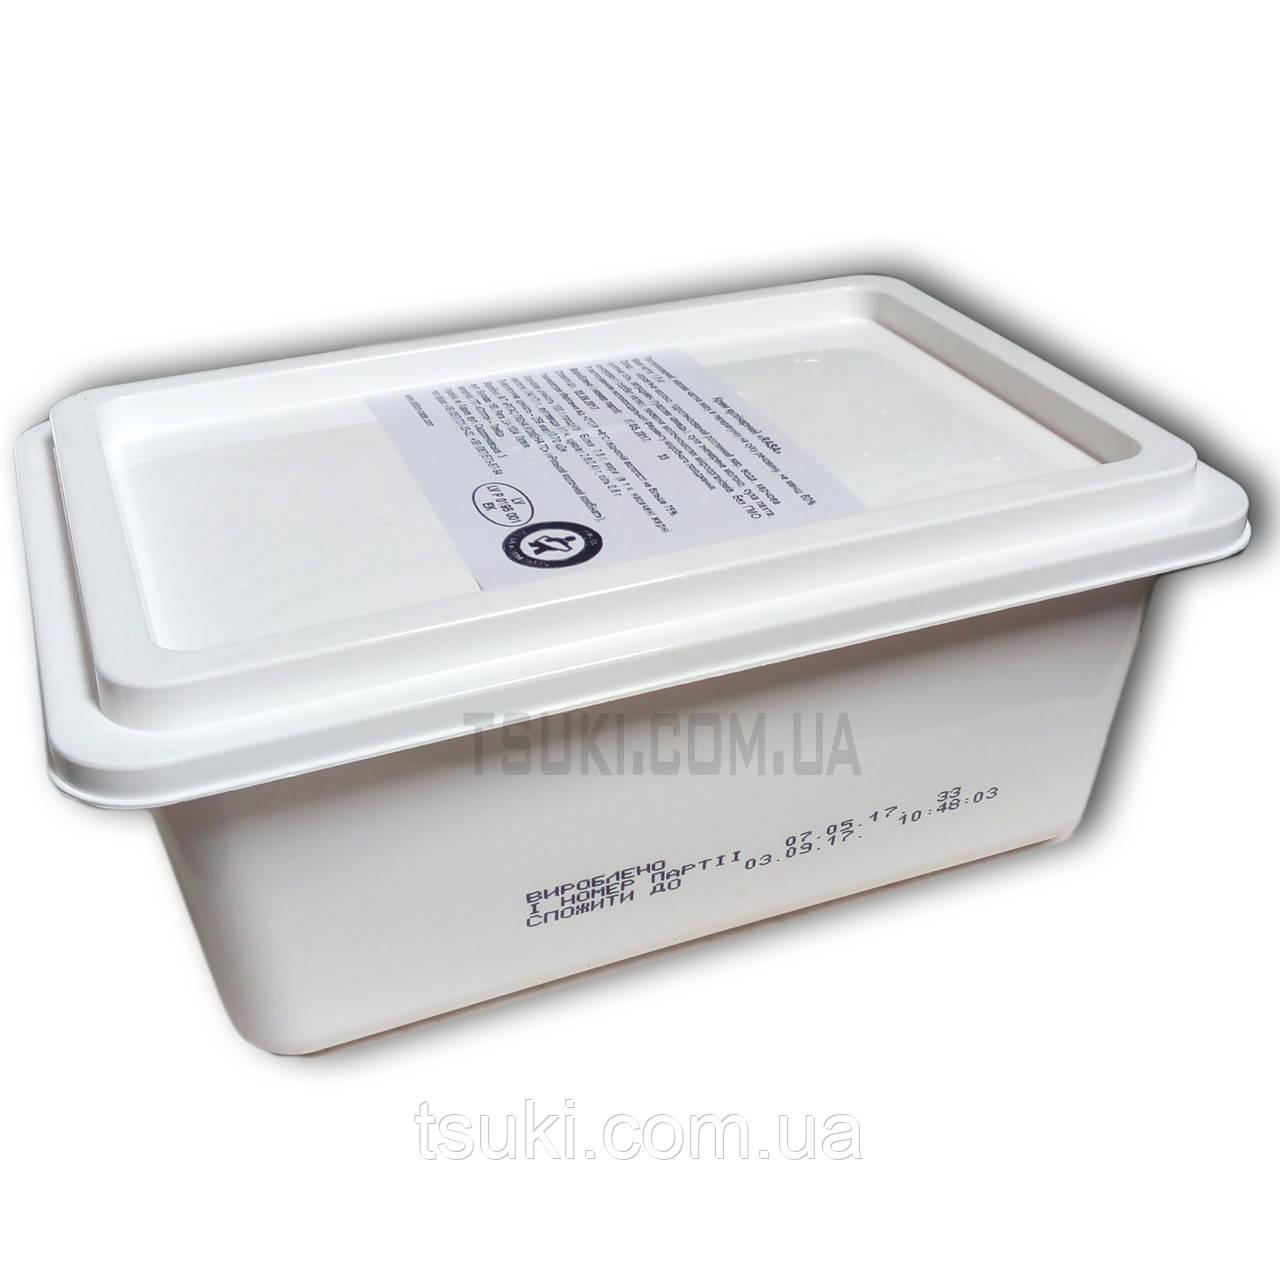 "Крем сыр для суши ""RASA"" 66% 1,5 кг."